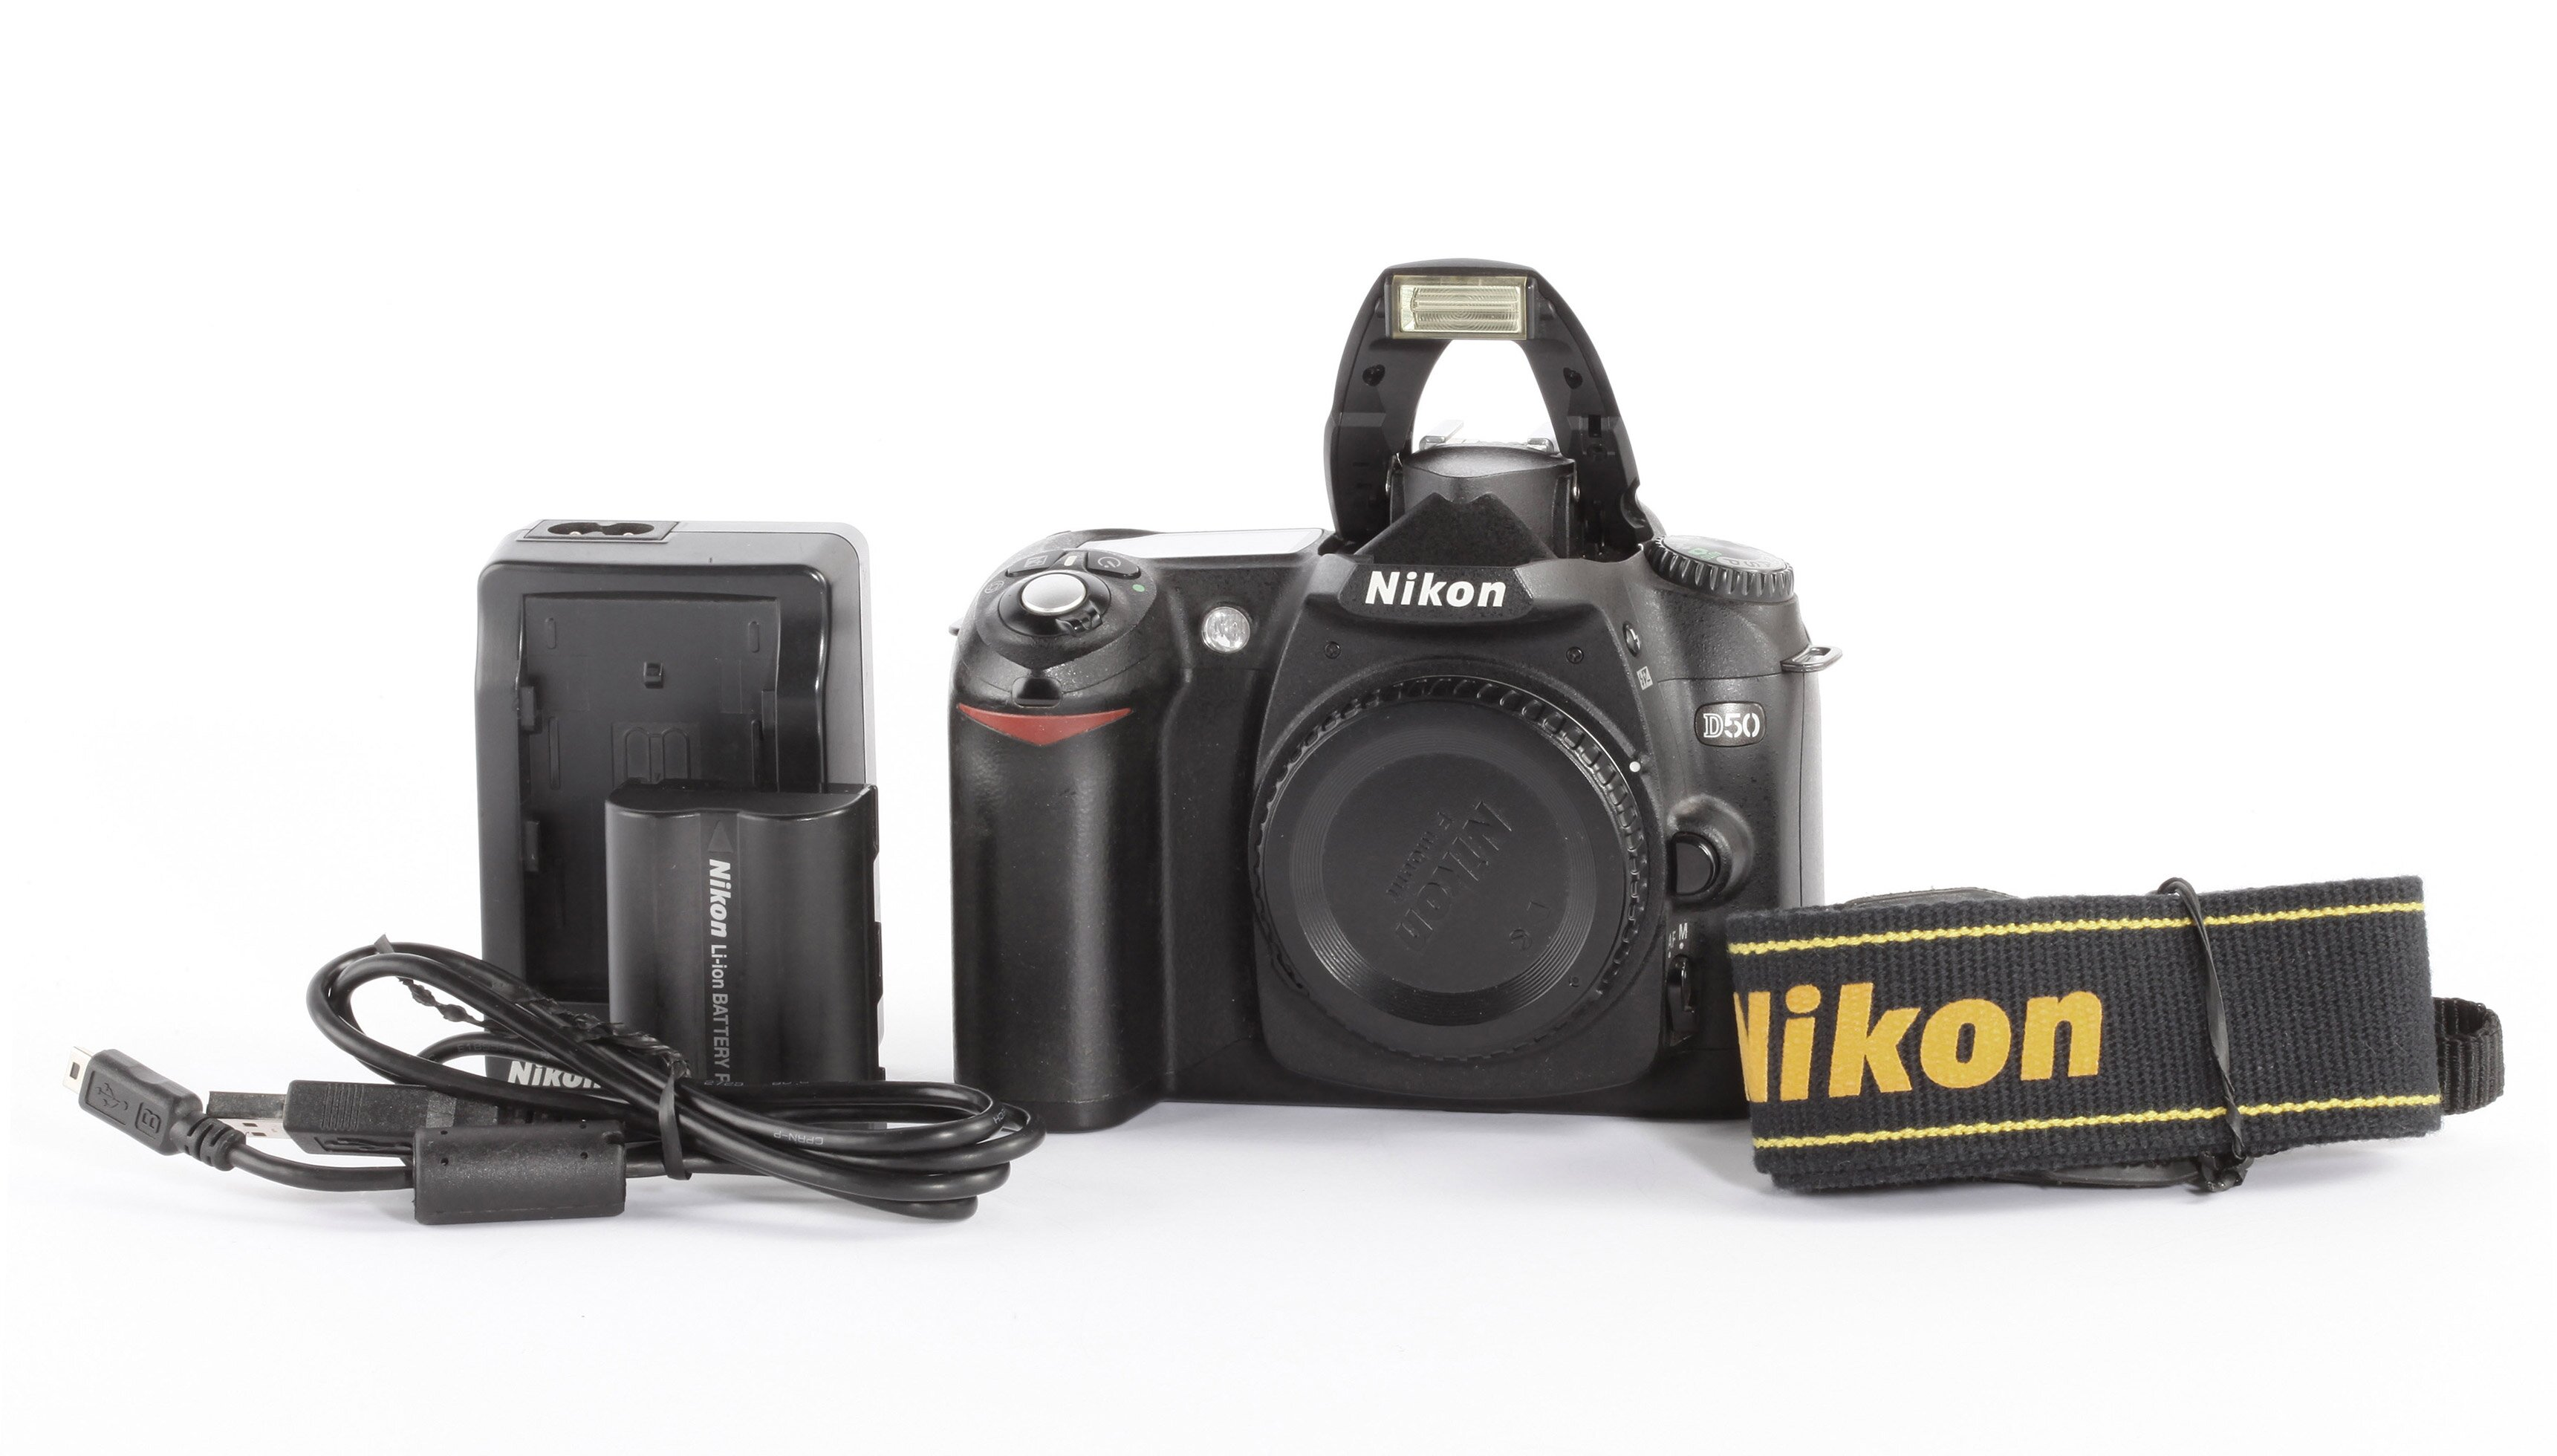 Nikon D50 Gehäuse